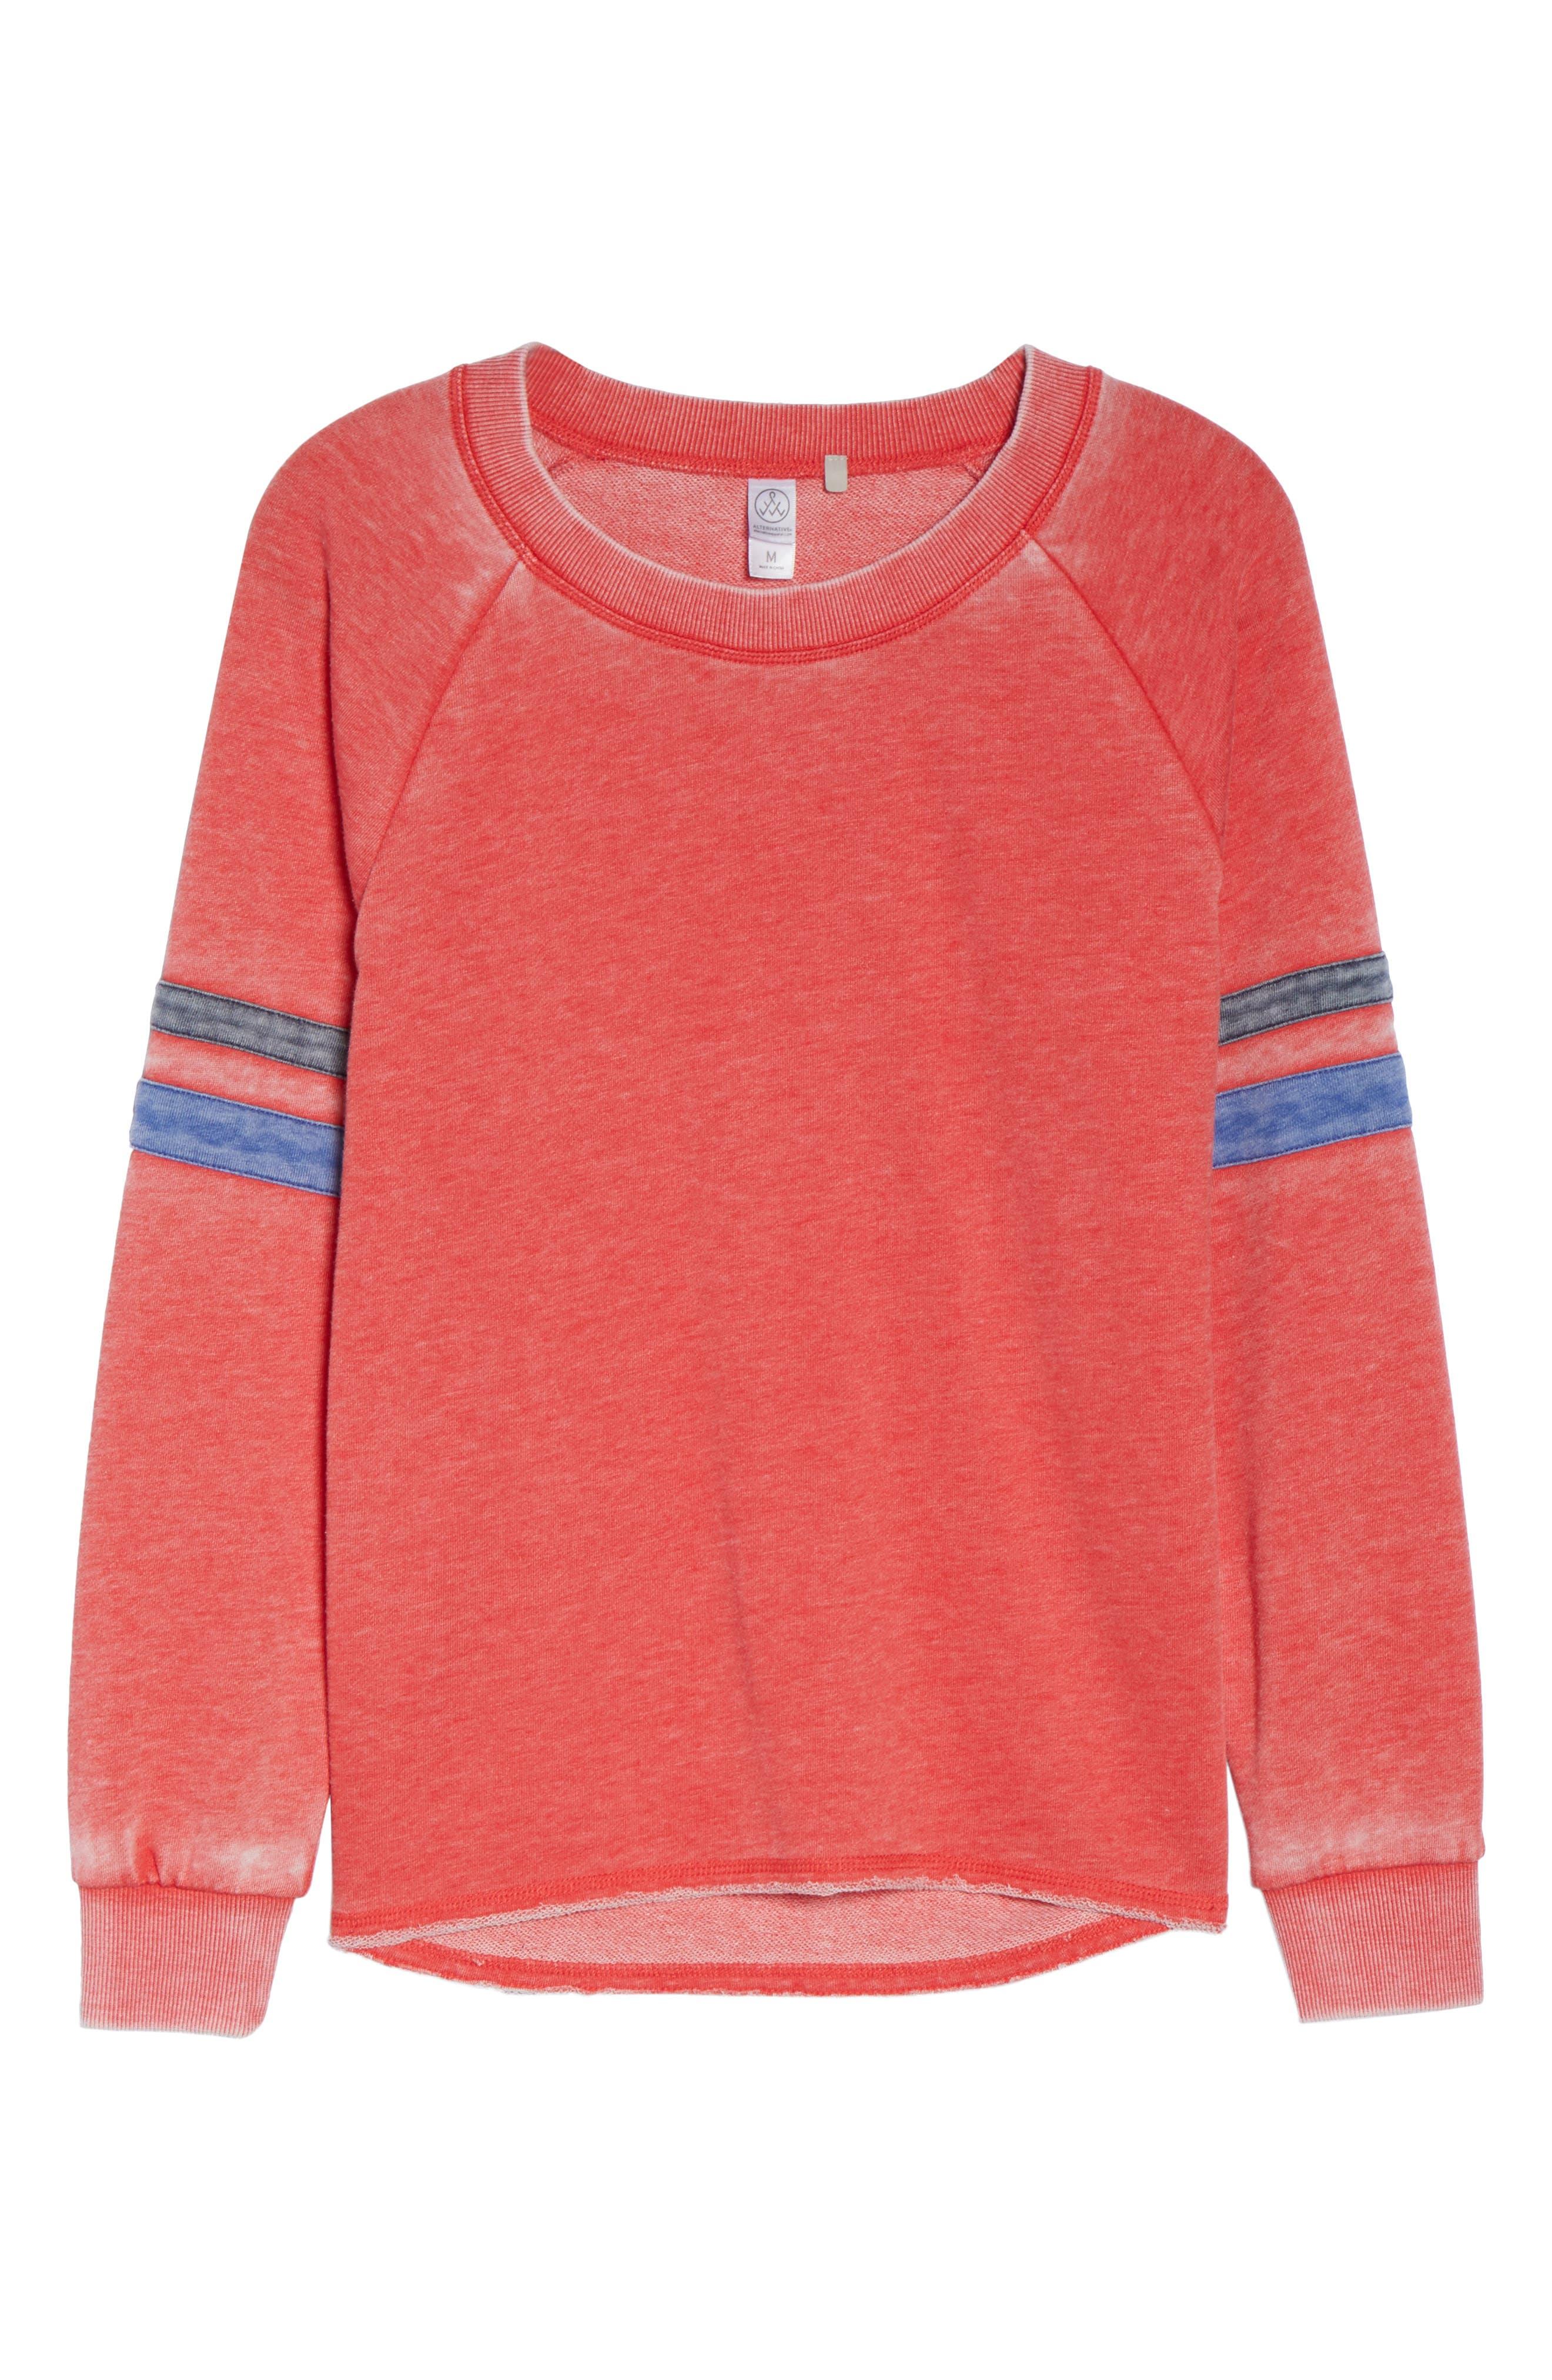 Lazy Day Sweatshirt,                             Alternate thumbnail 11, color,